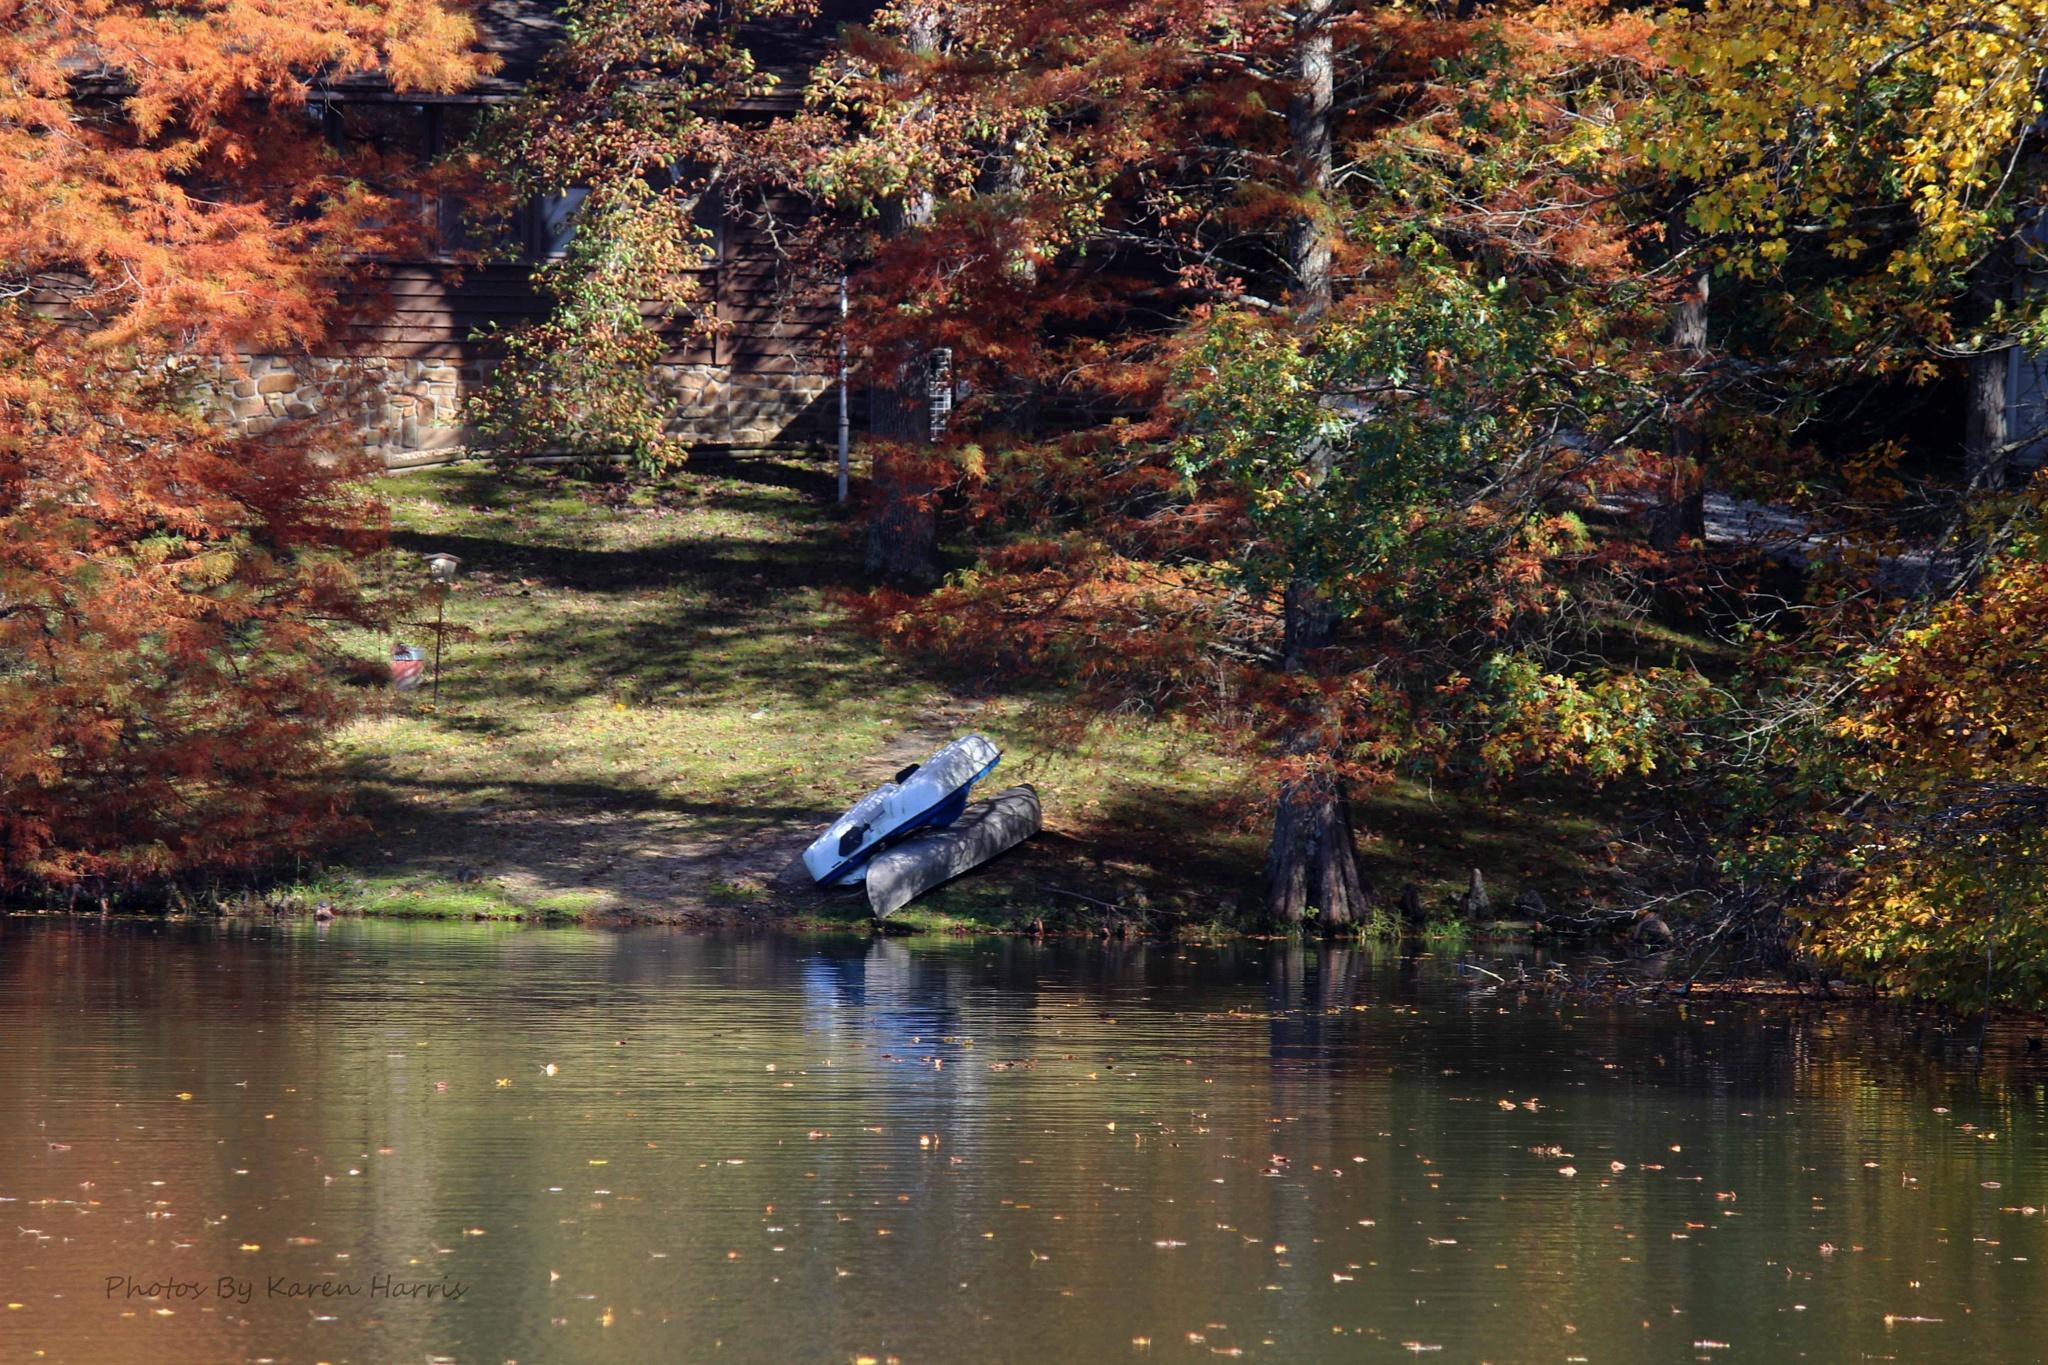 Autumn Kayaks by Karen Harris